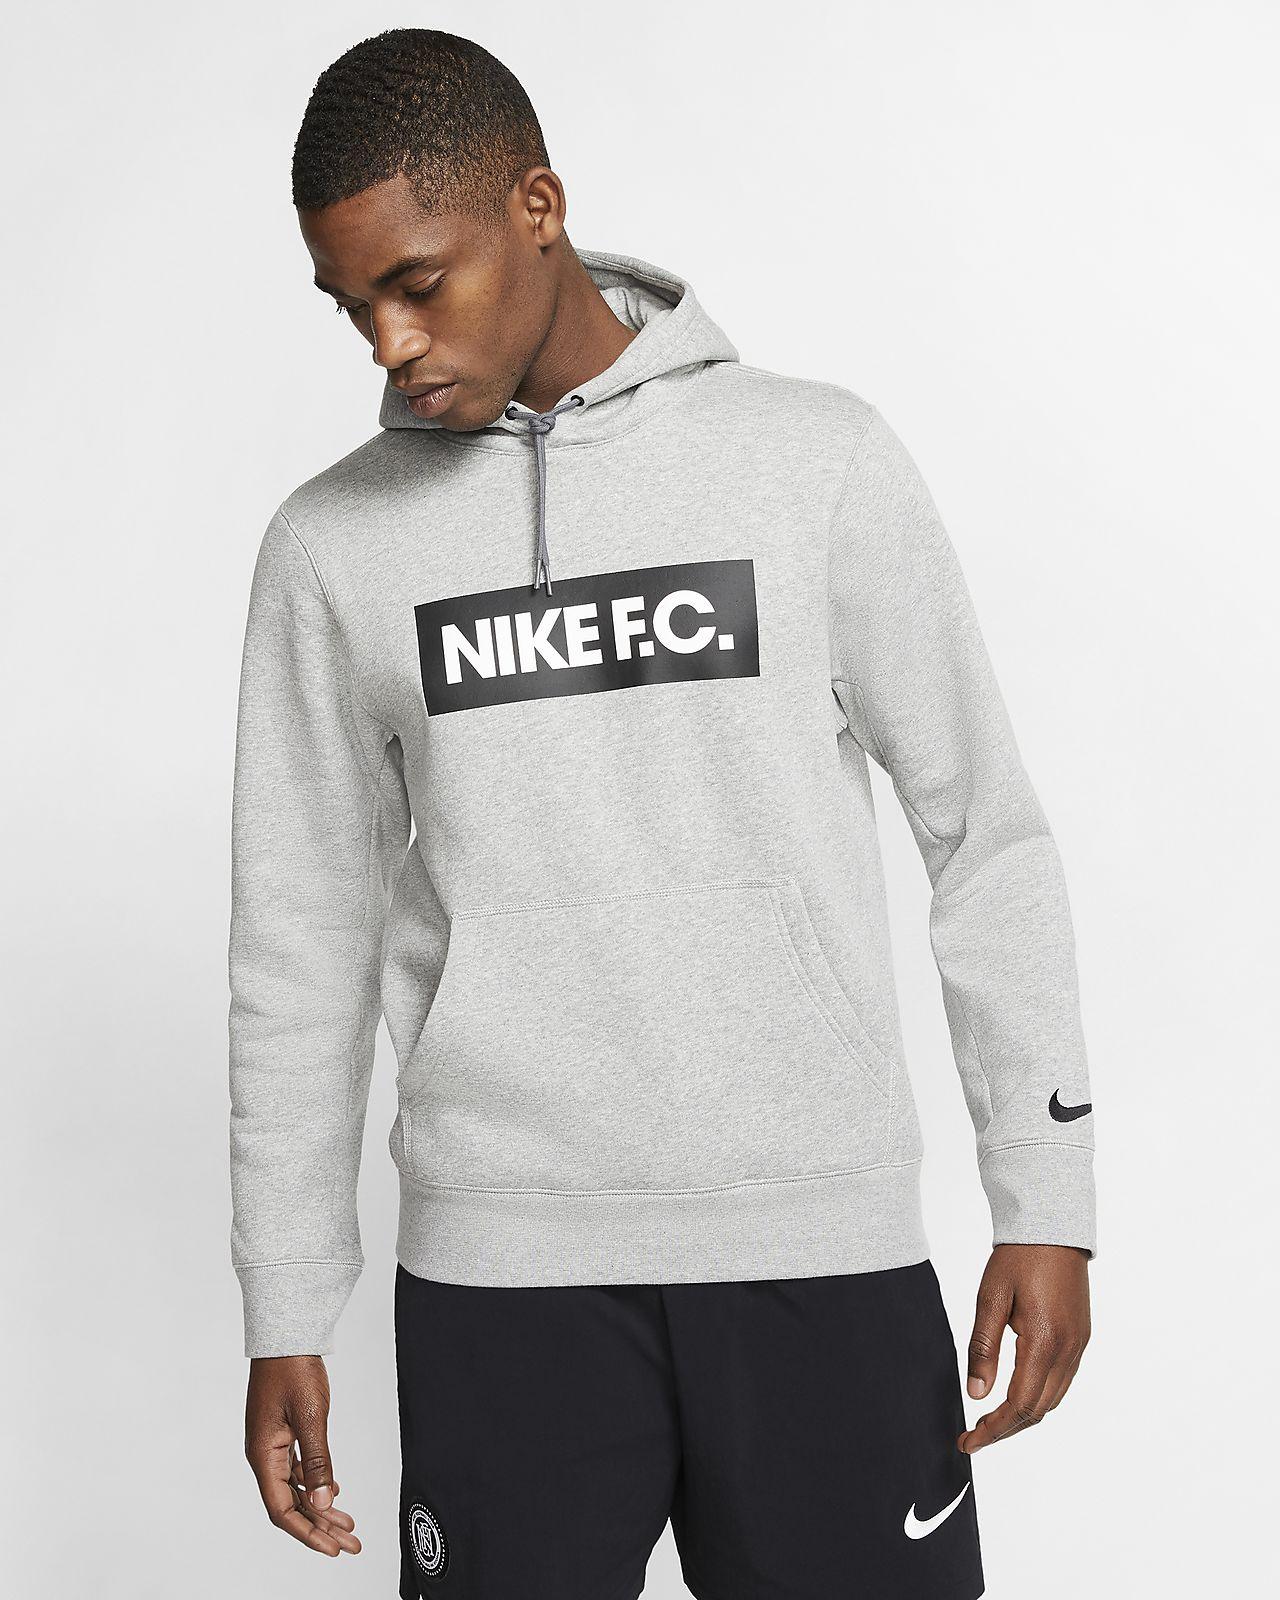 Nike F.C. Men's Pullover Fleece Football Hoodie